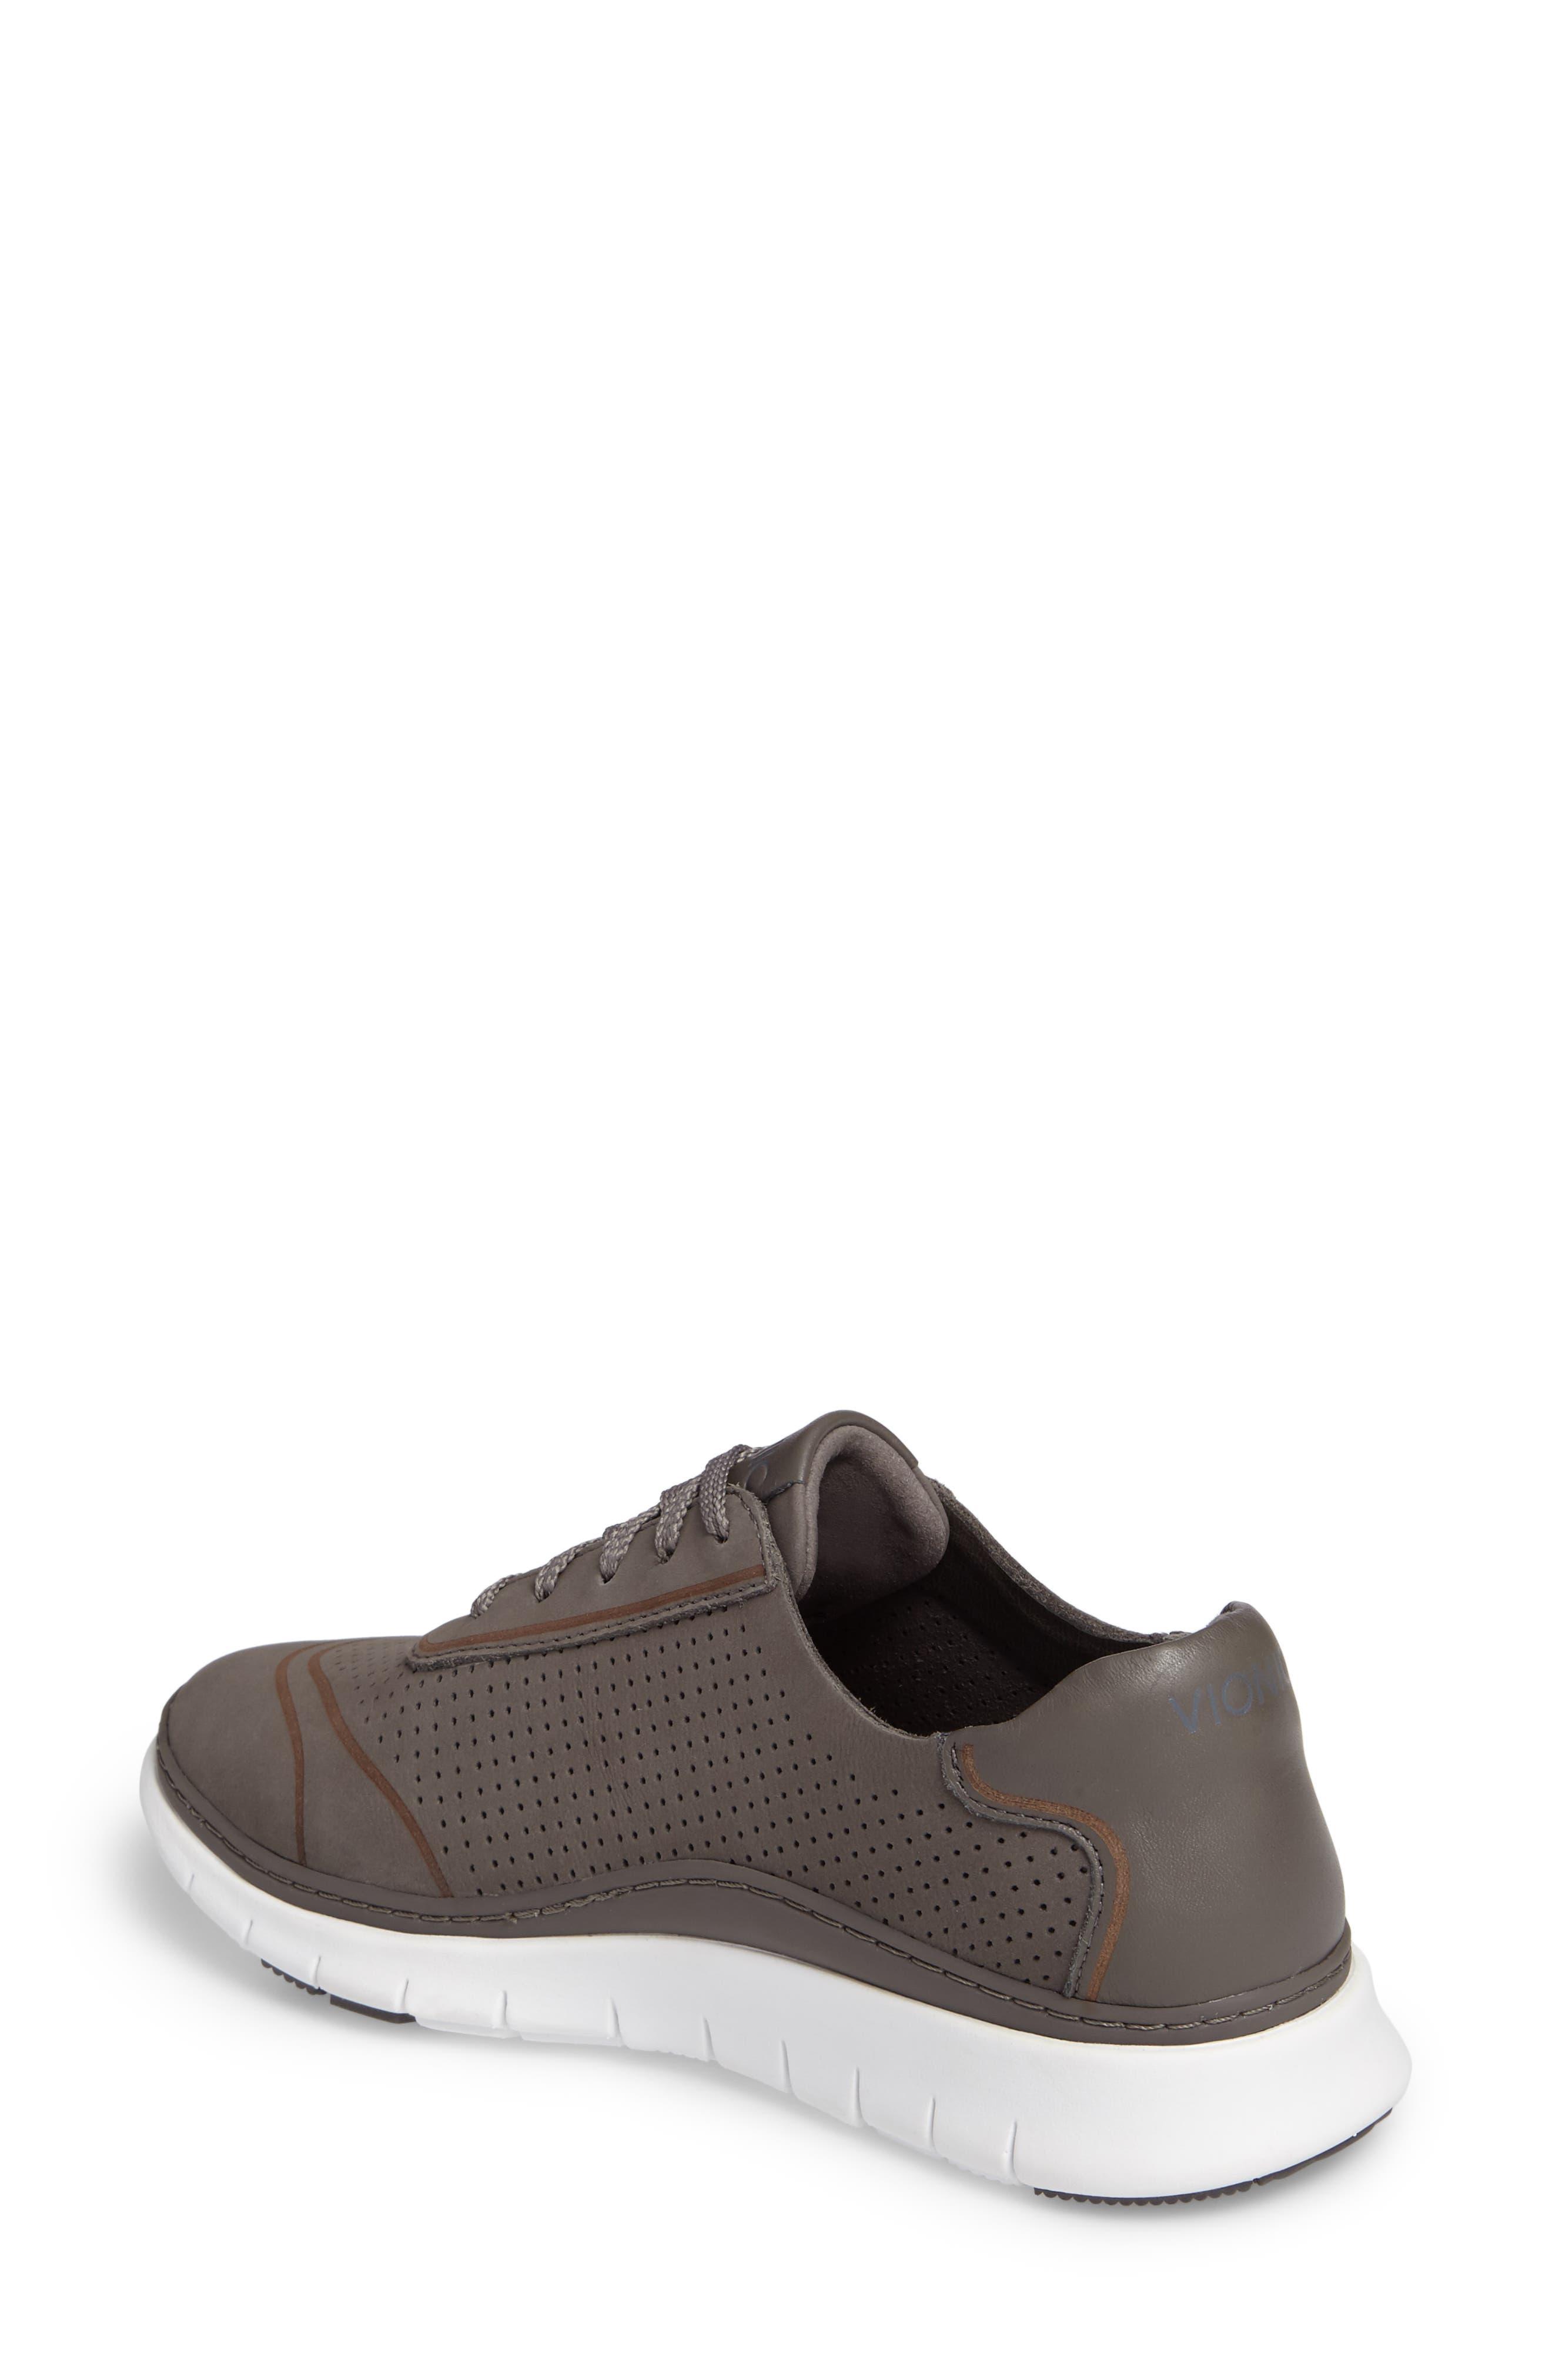 Fresh Riley Perforated Sneaker,                             Alternate thumbnail 6, color,